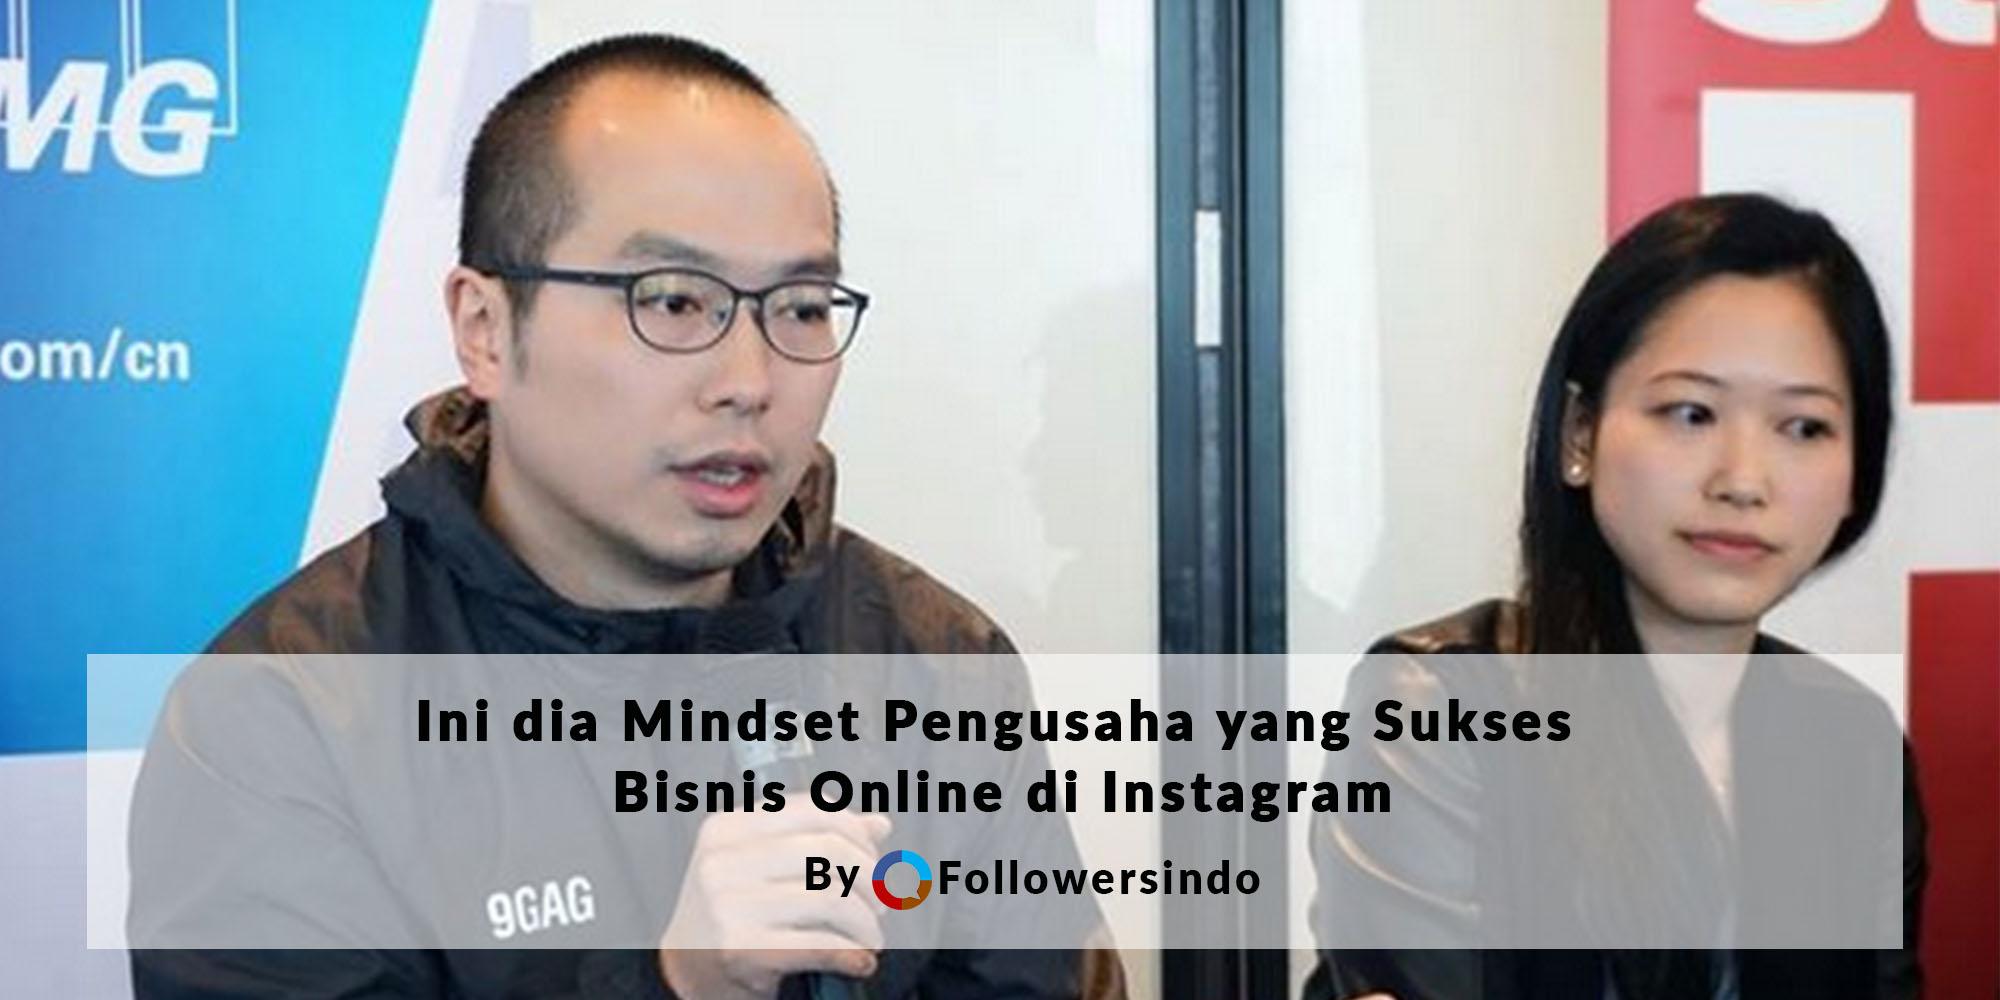 mindset pengusaha sukses bisnis online di instagram - Followersindo.com